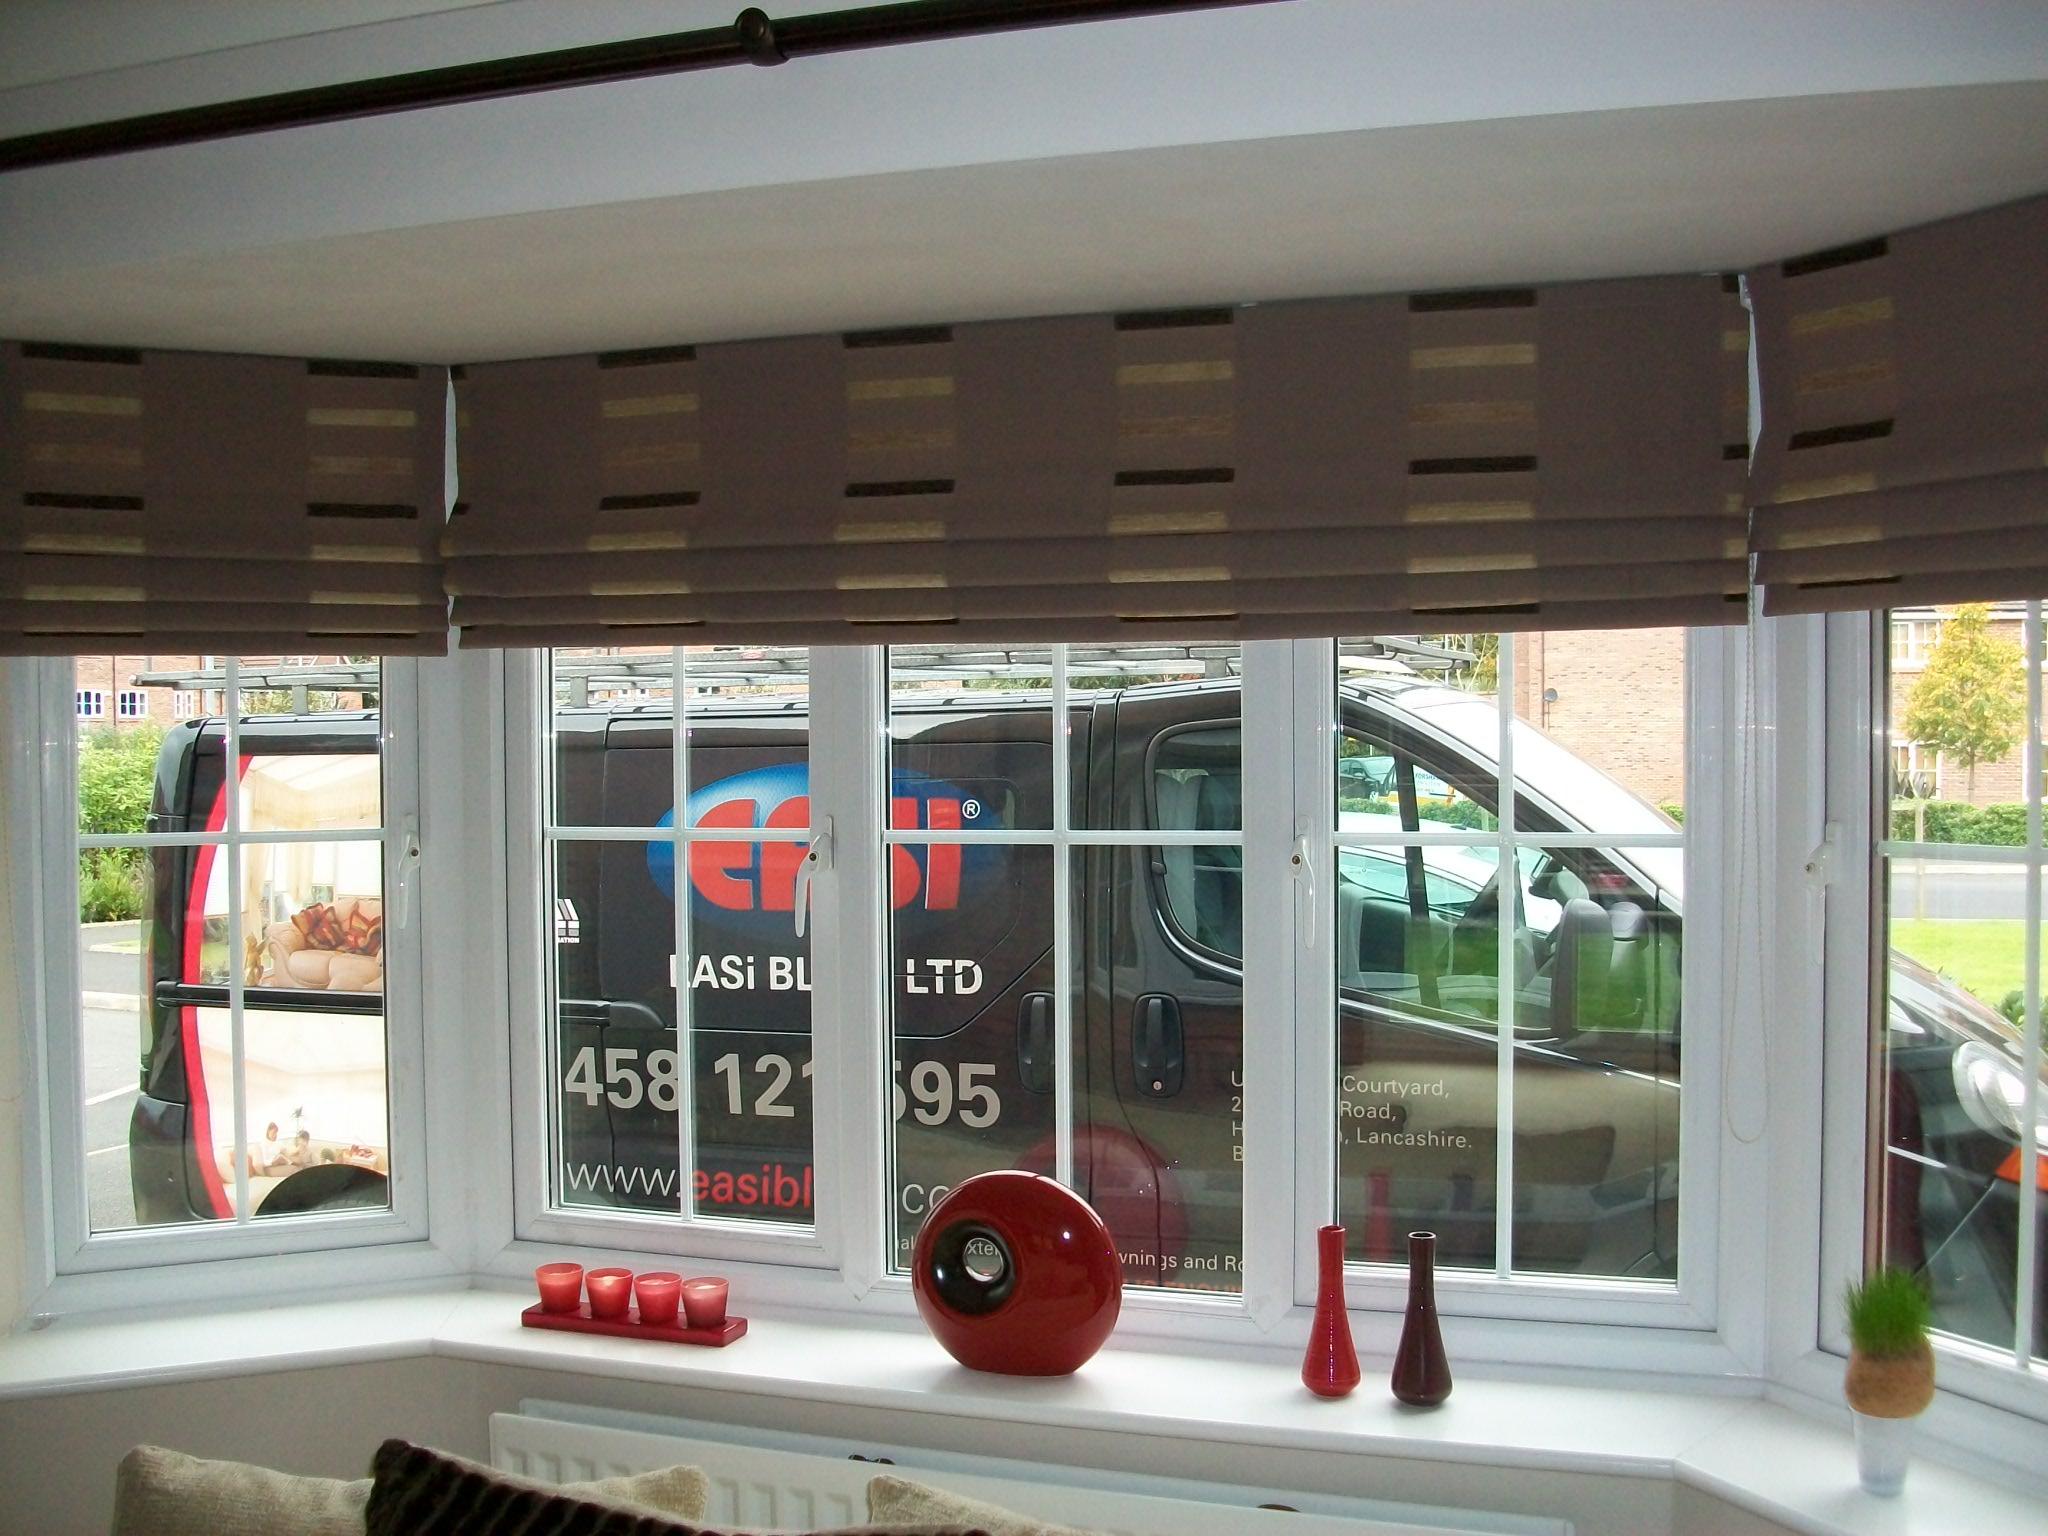 plantation custom with standard com split visit us drapes and louver wood sill trim mycreativewindow pin shutters tilt drape at bar